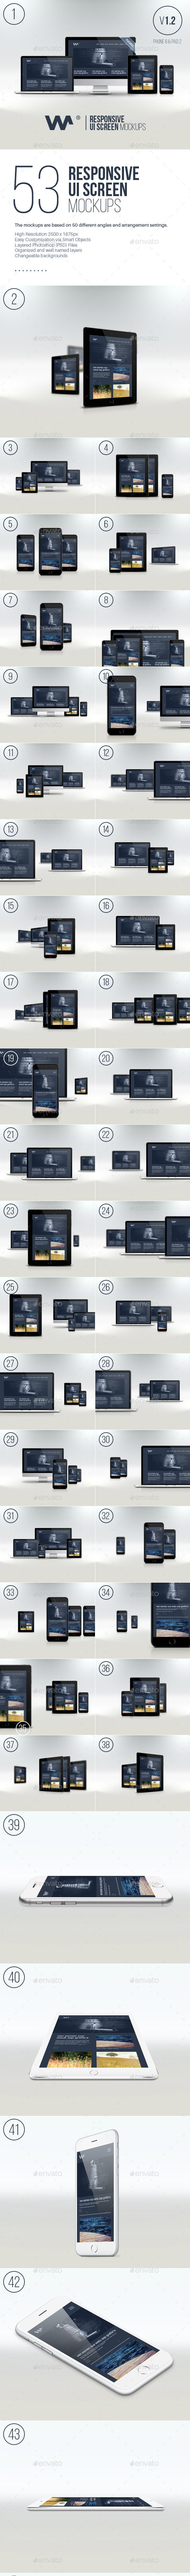 Responsive Website Devices & Screen Mockups